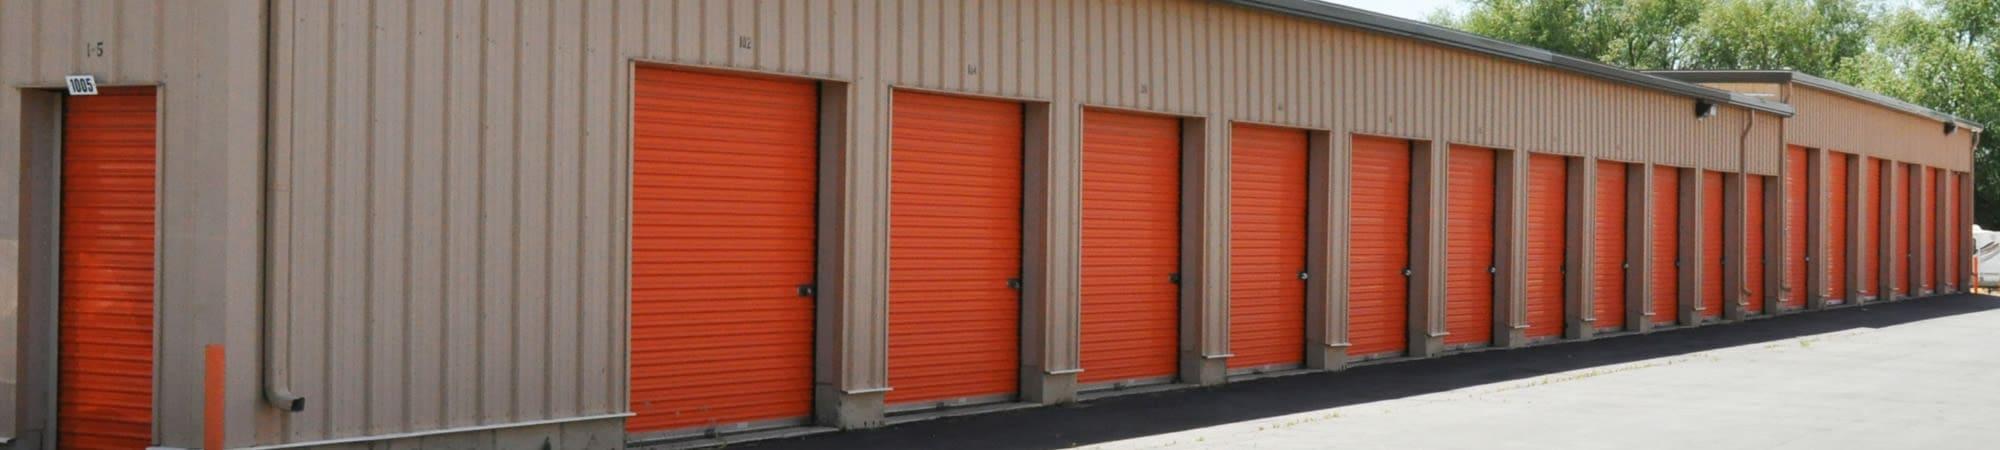 Lock It Up Self Storage self storage units for rent in North Ogden, Utah